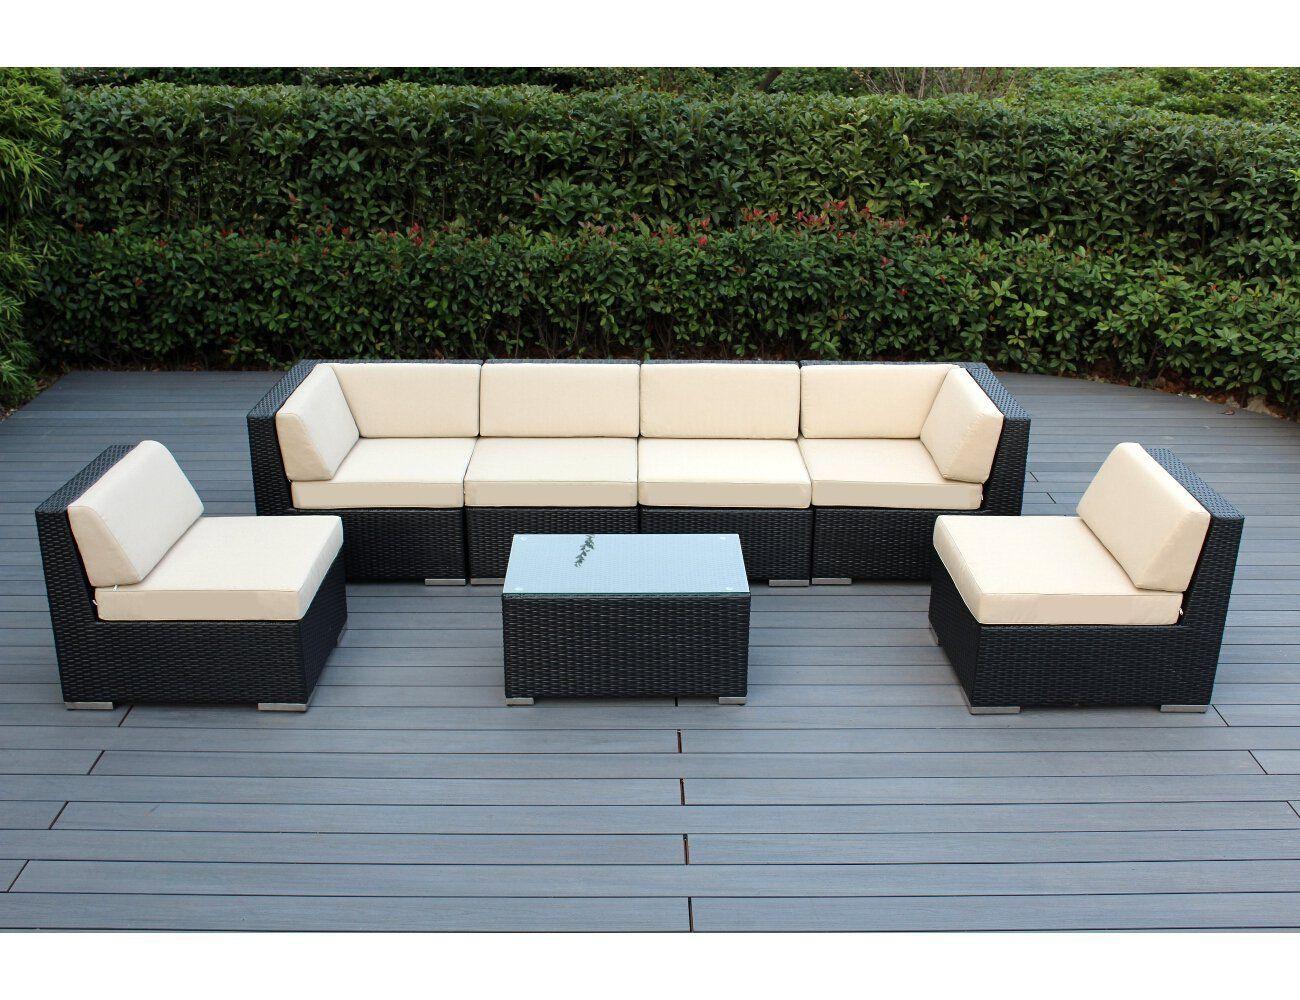 Ohana 7Piece Outdoor Patio Wicker Furniture Sectional